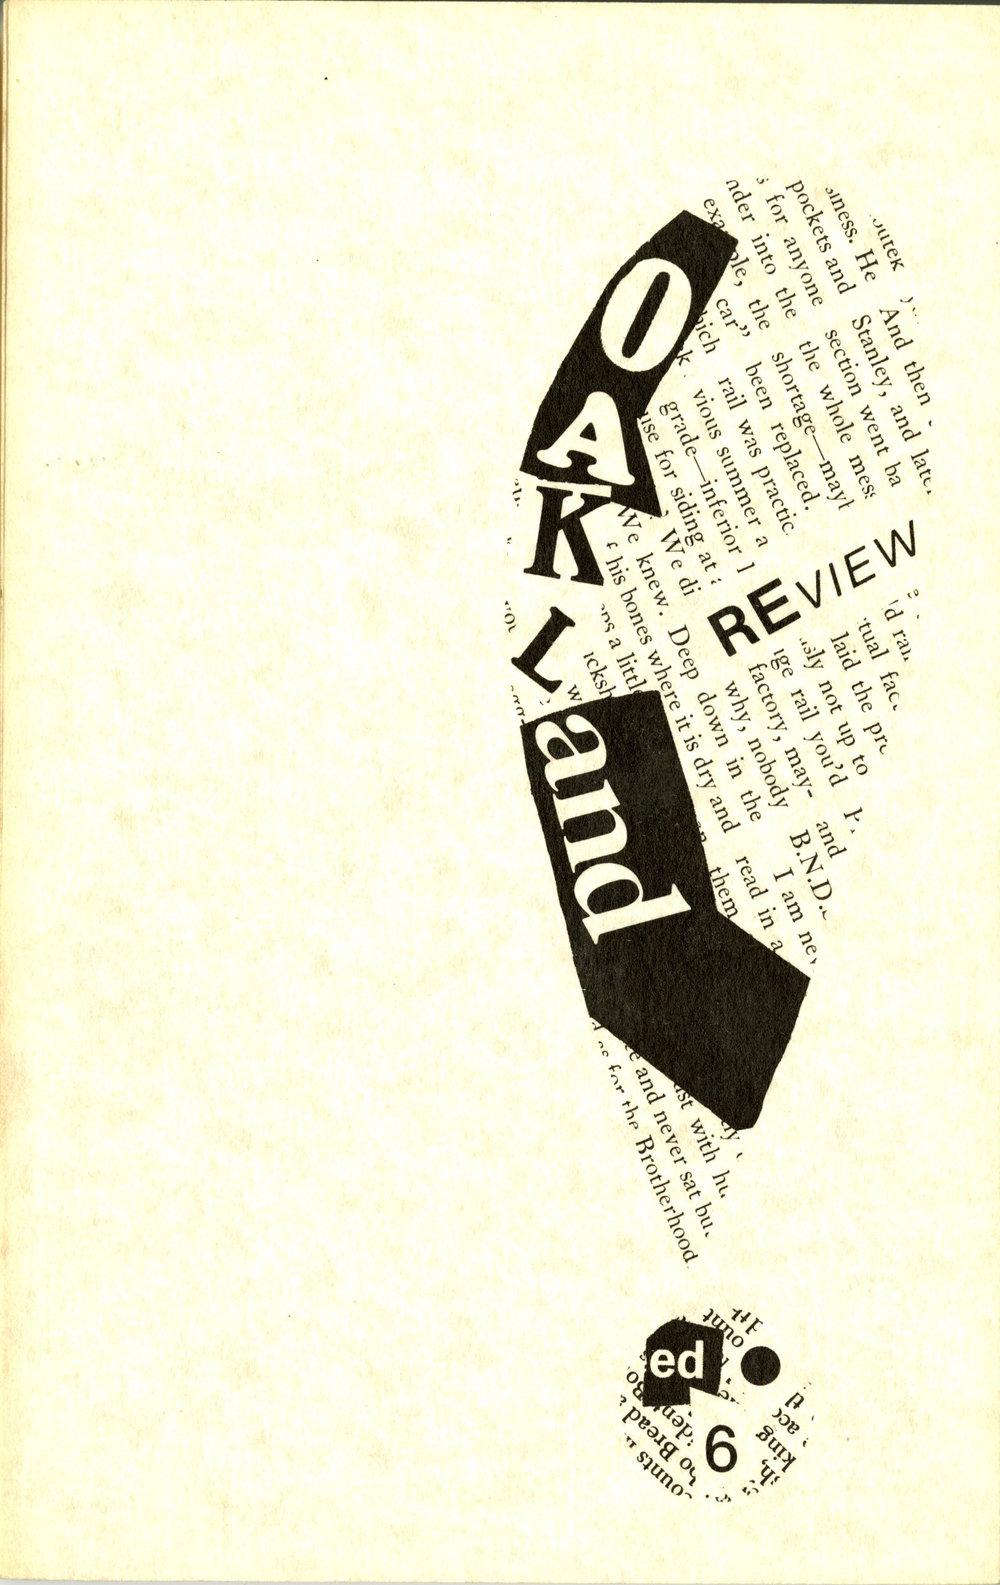 Volume VI, Front (1978)